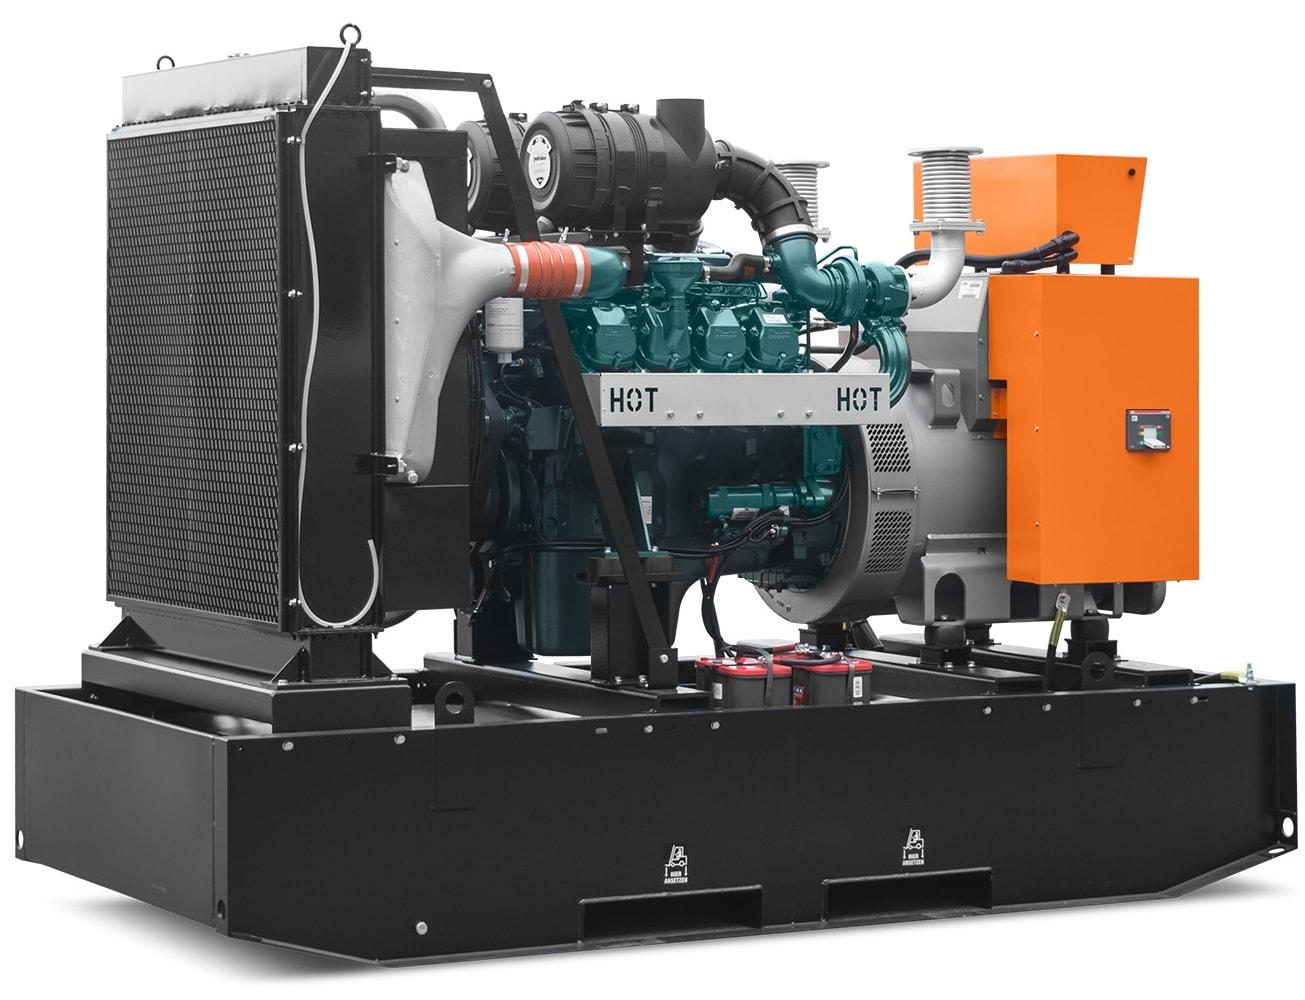 дизельная электростанция rid 500 c-series